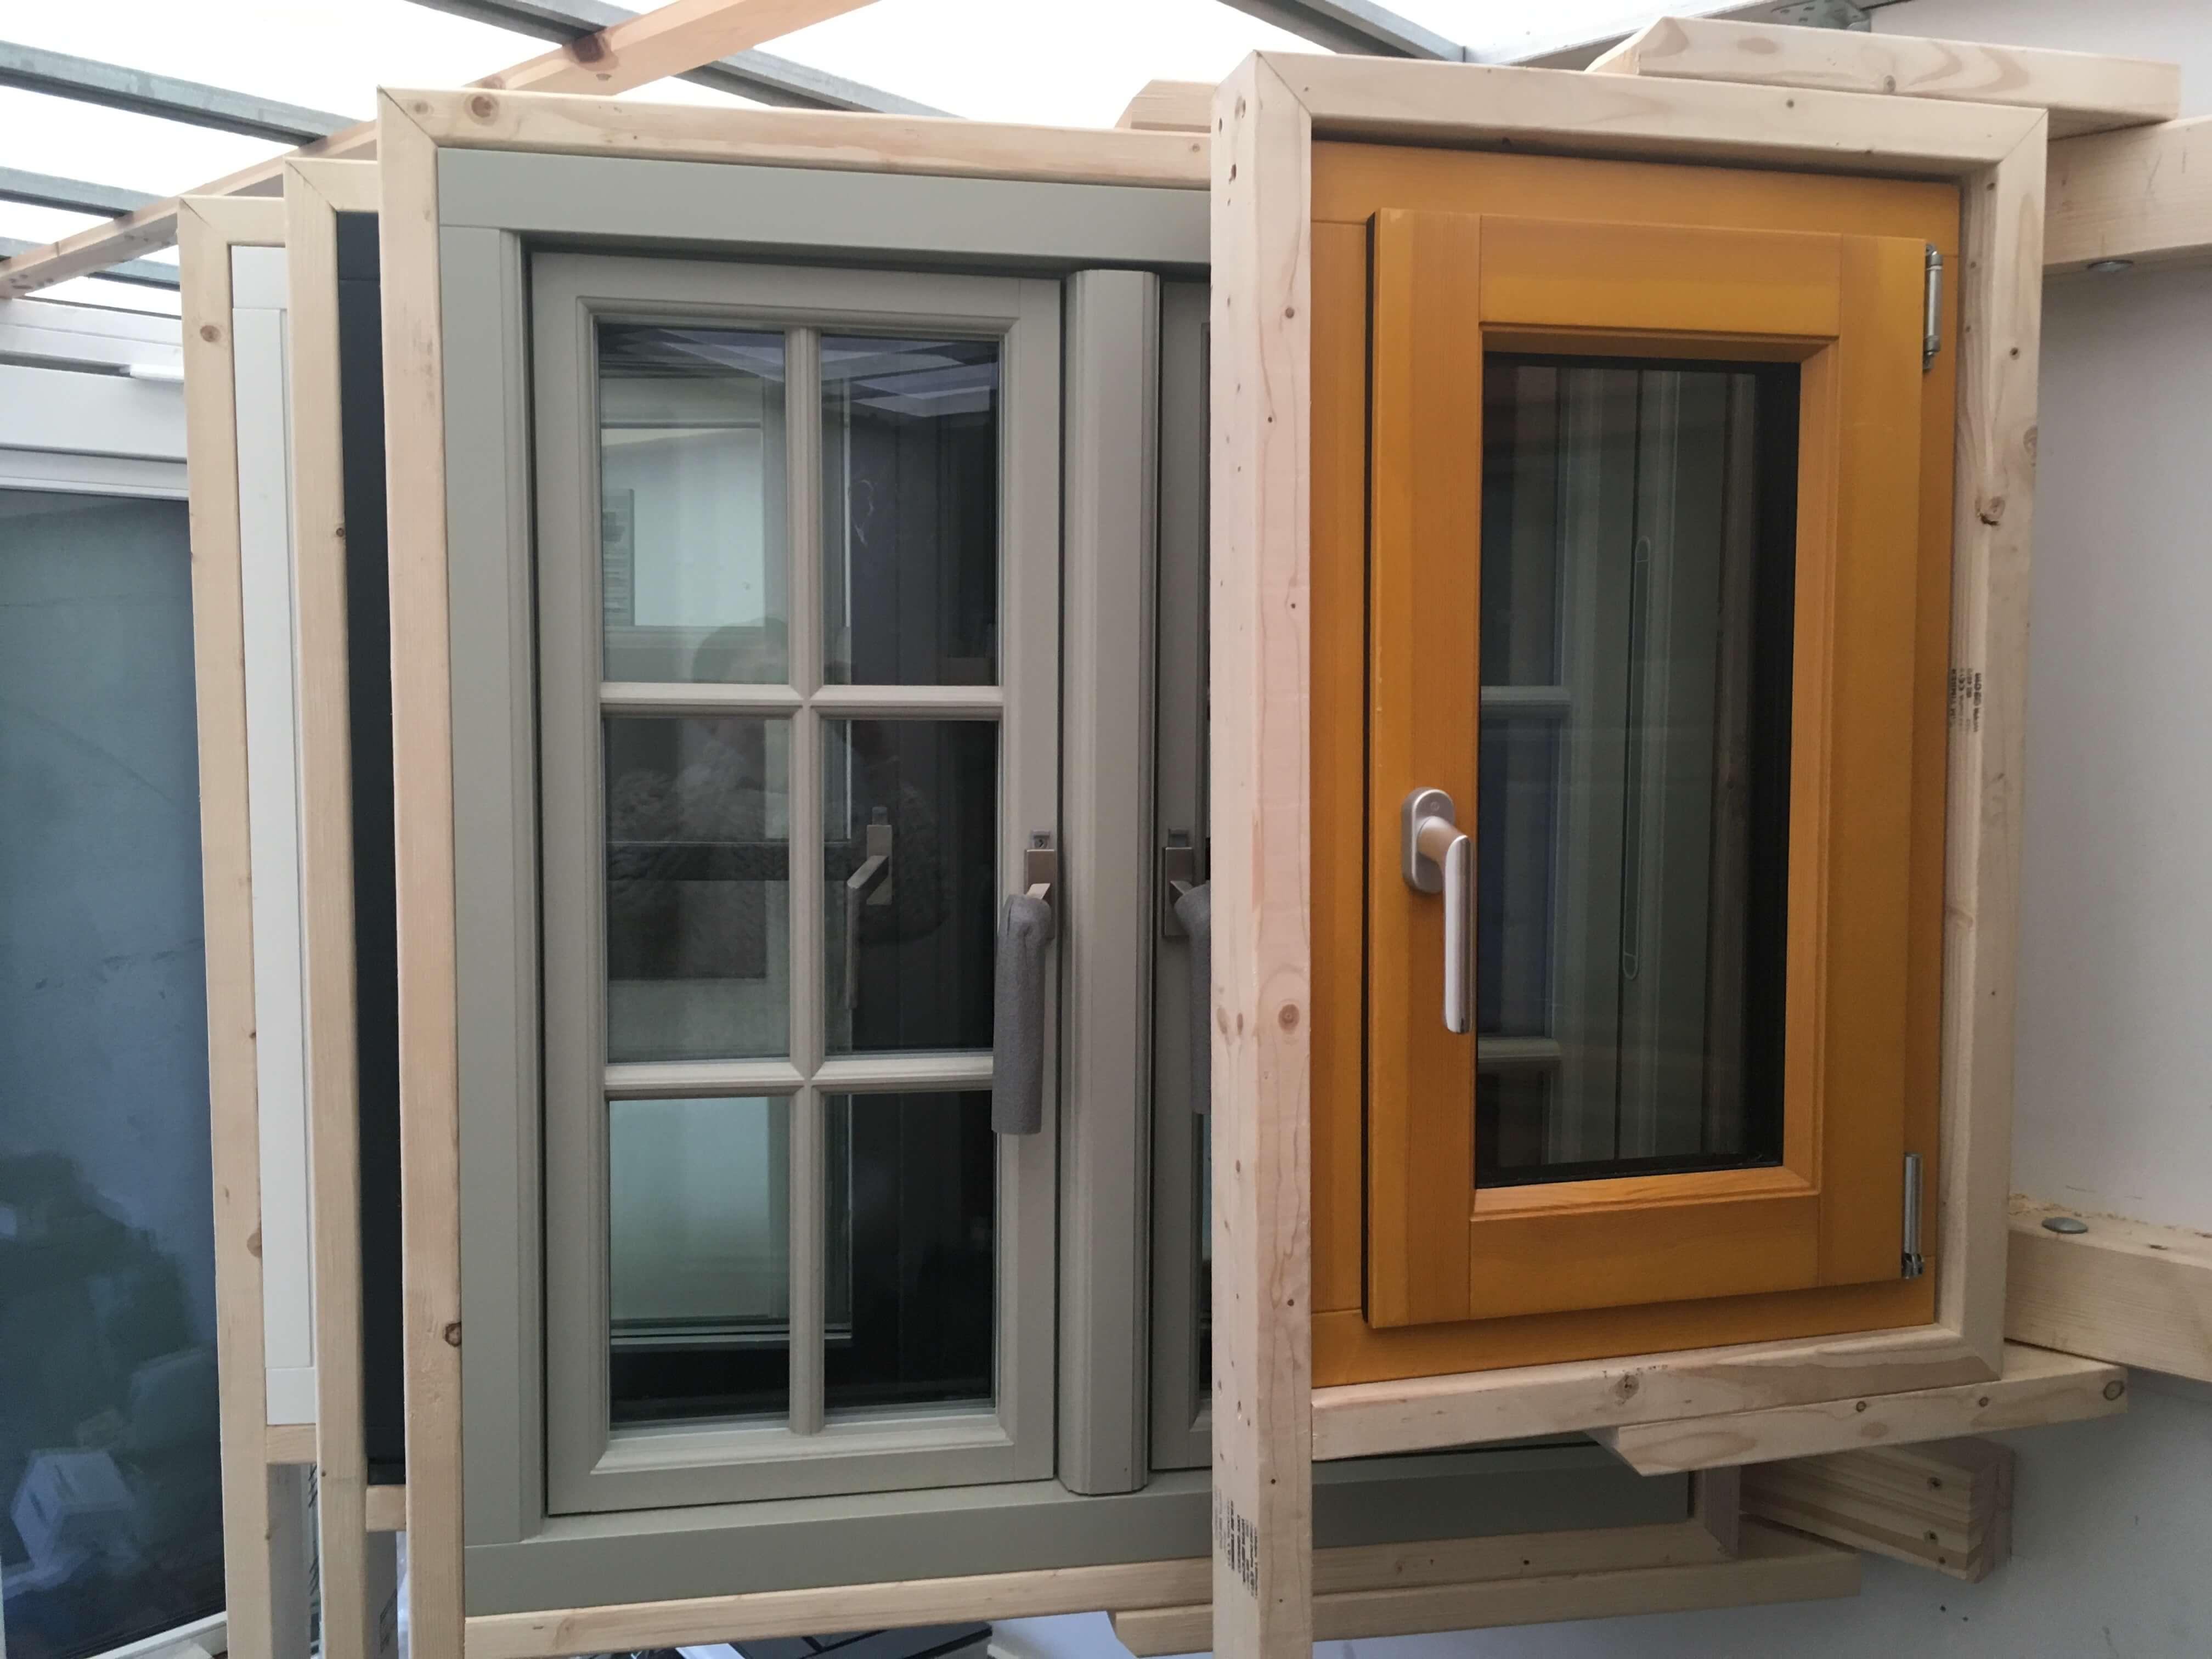 Outward Versus Inward Opening Windows